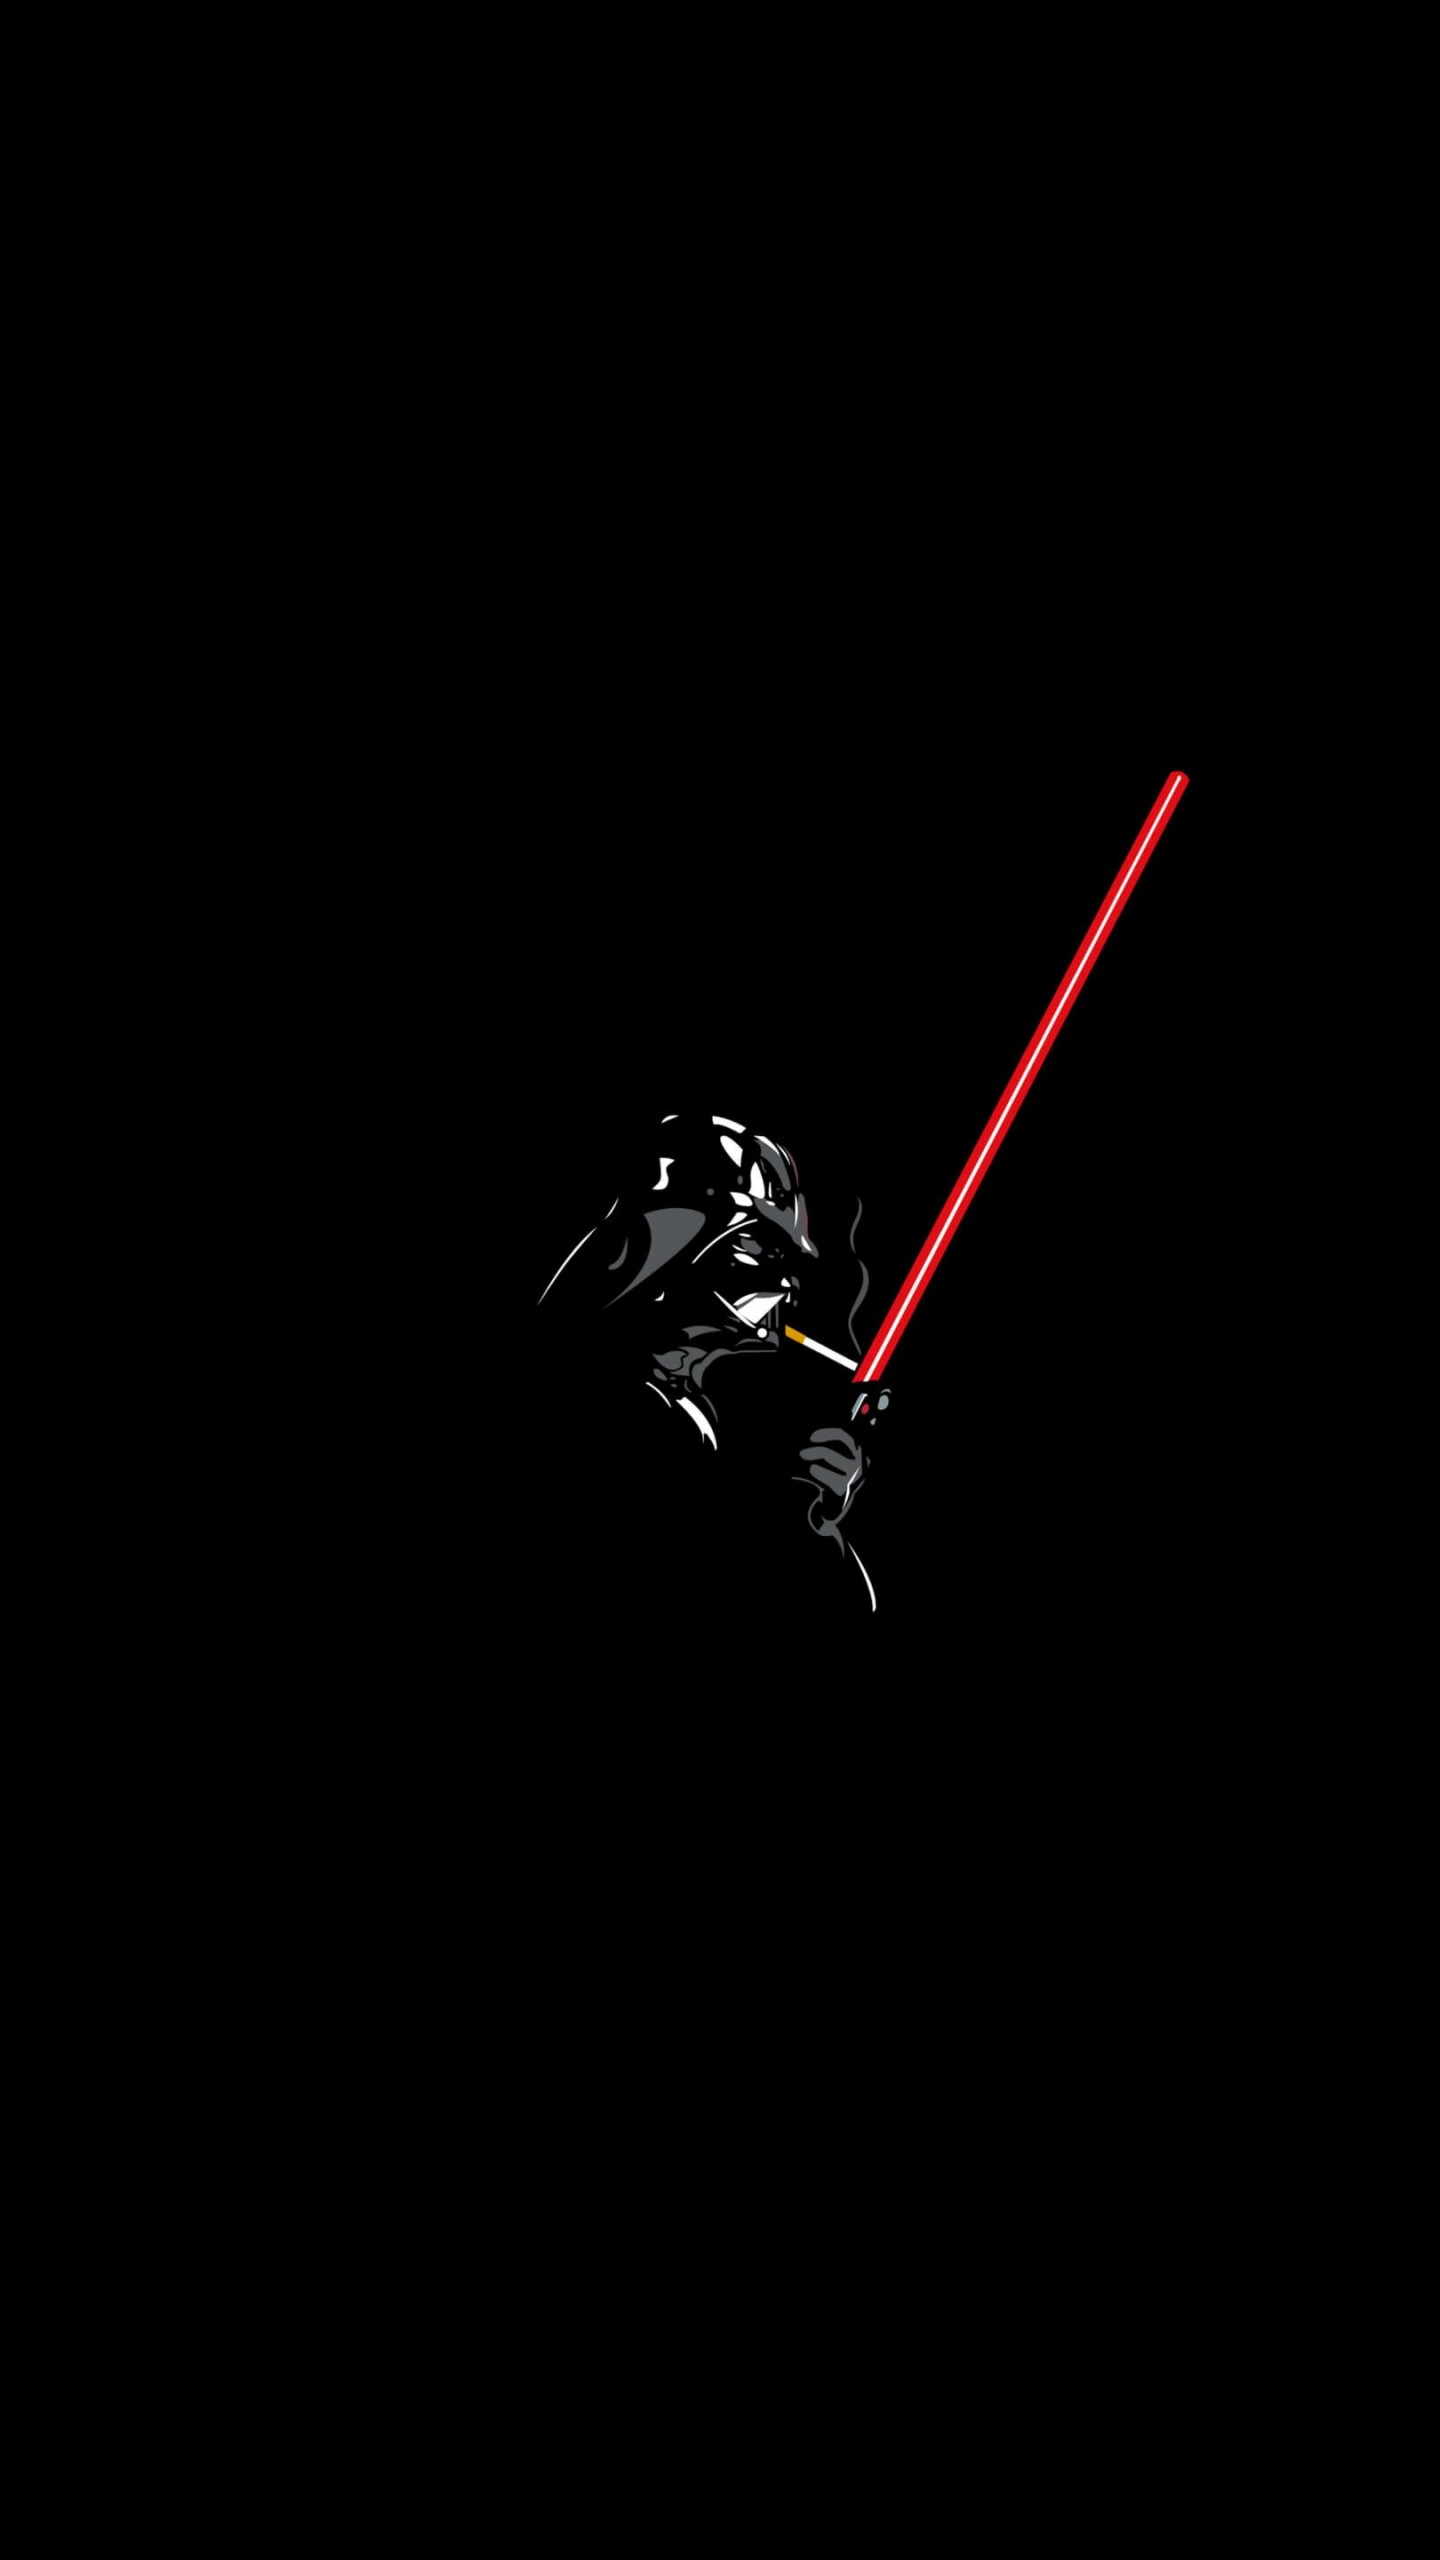 Darth Vader Lighting a Cigarette HD wallpaper for Nexus 6 ... Pictures Google